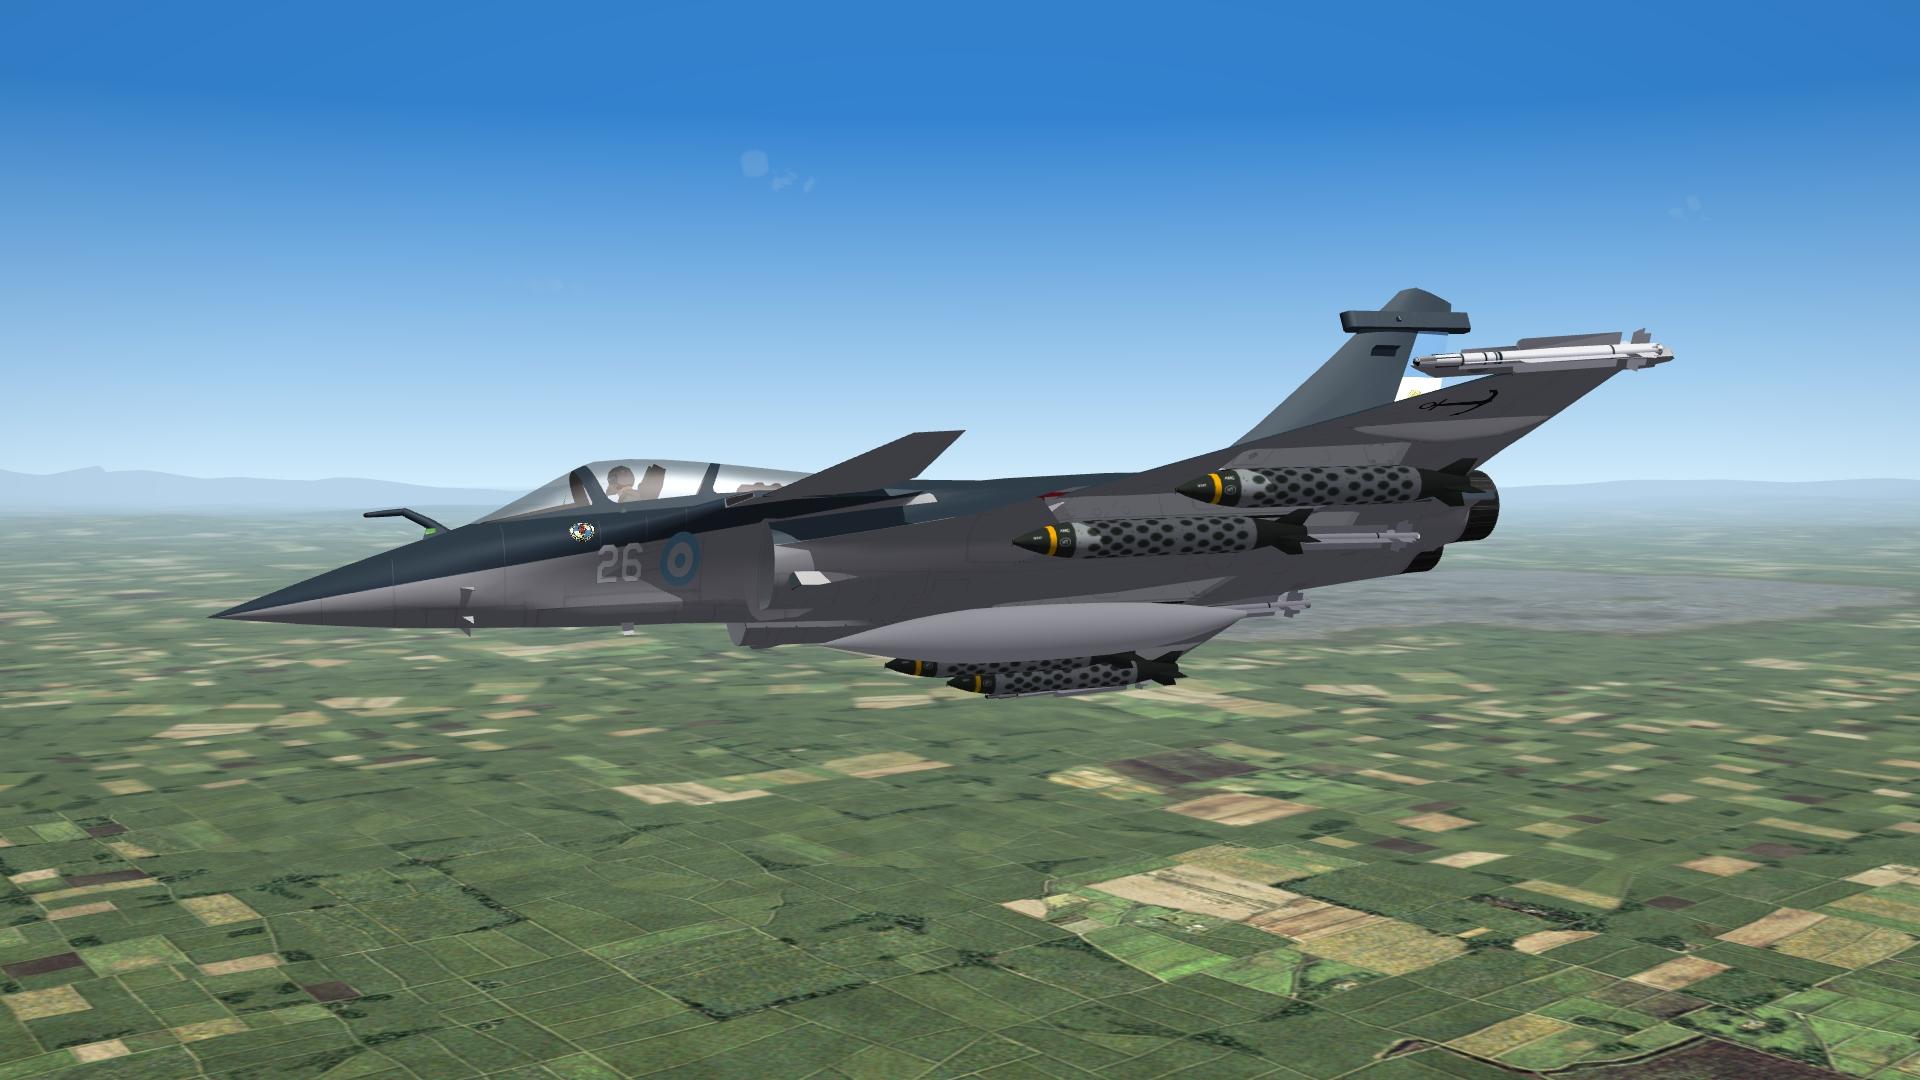 [Fictional] Dassault Vendaval (Storm)